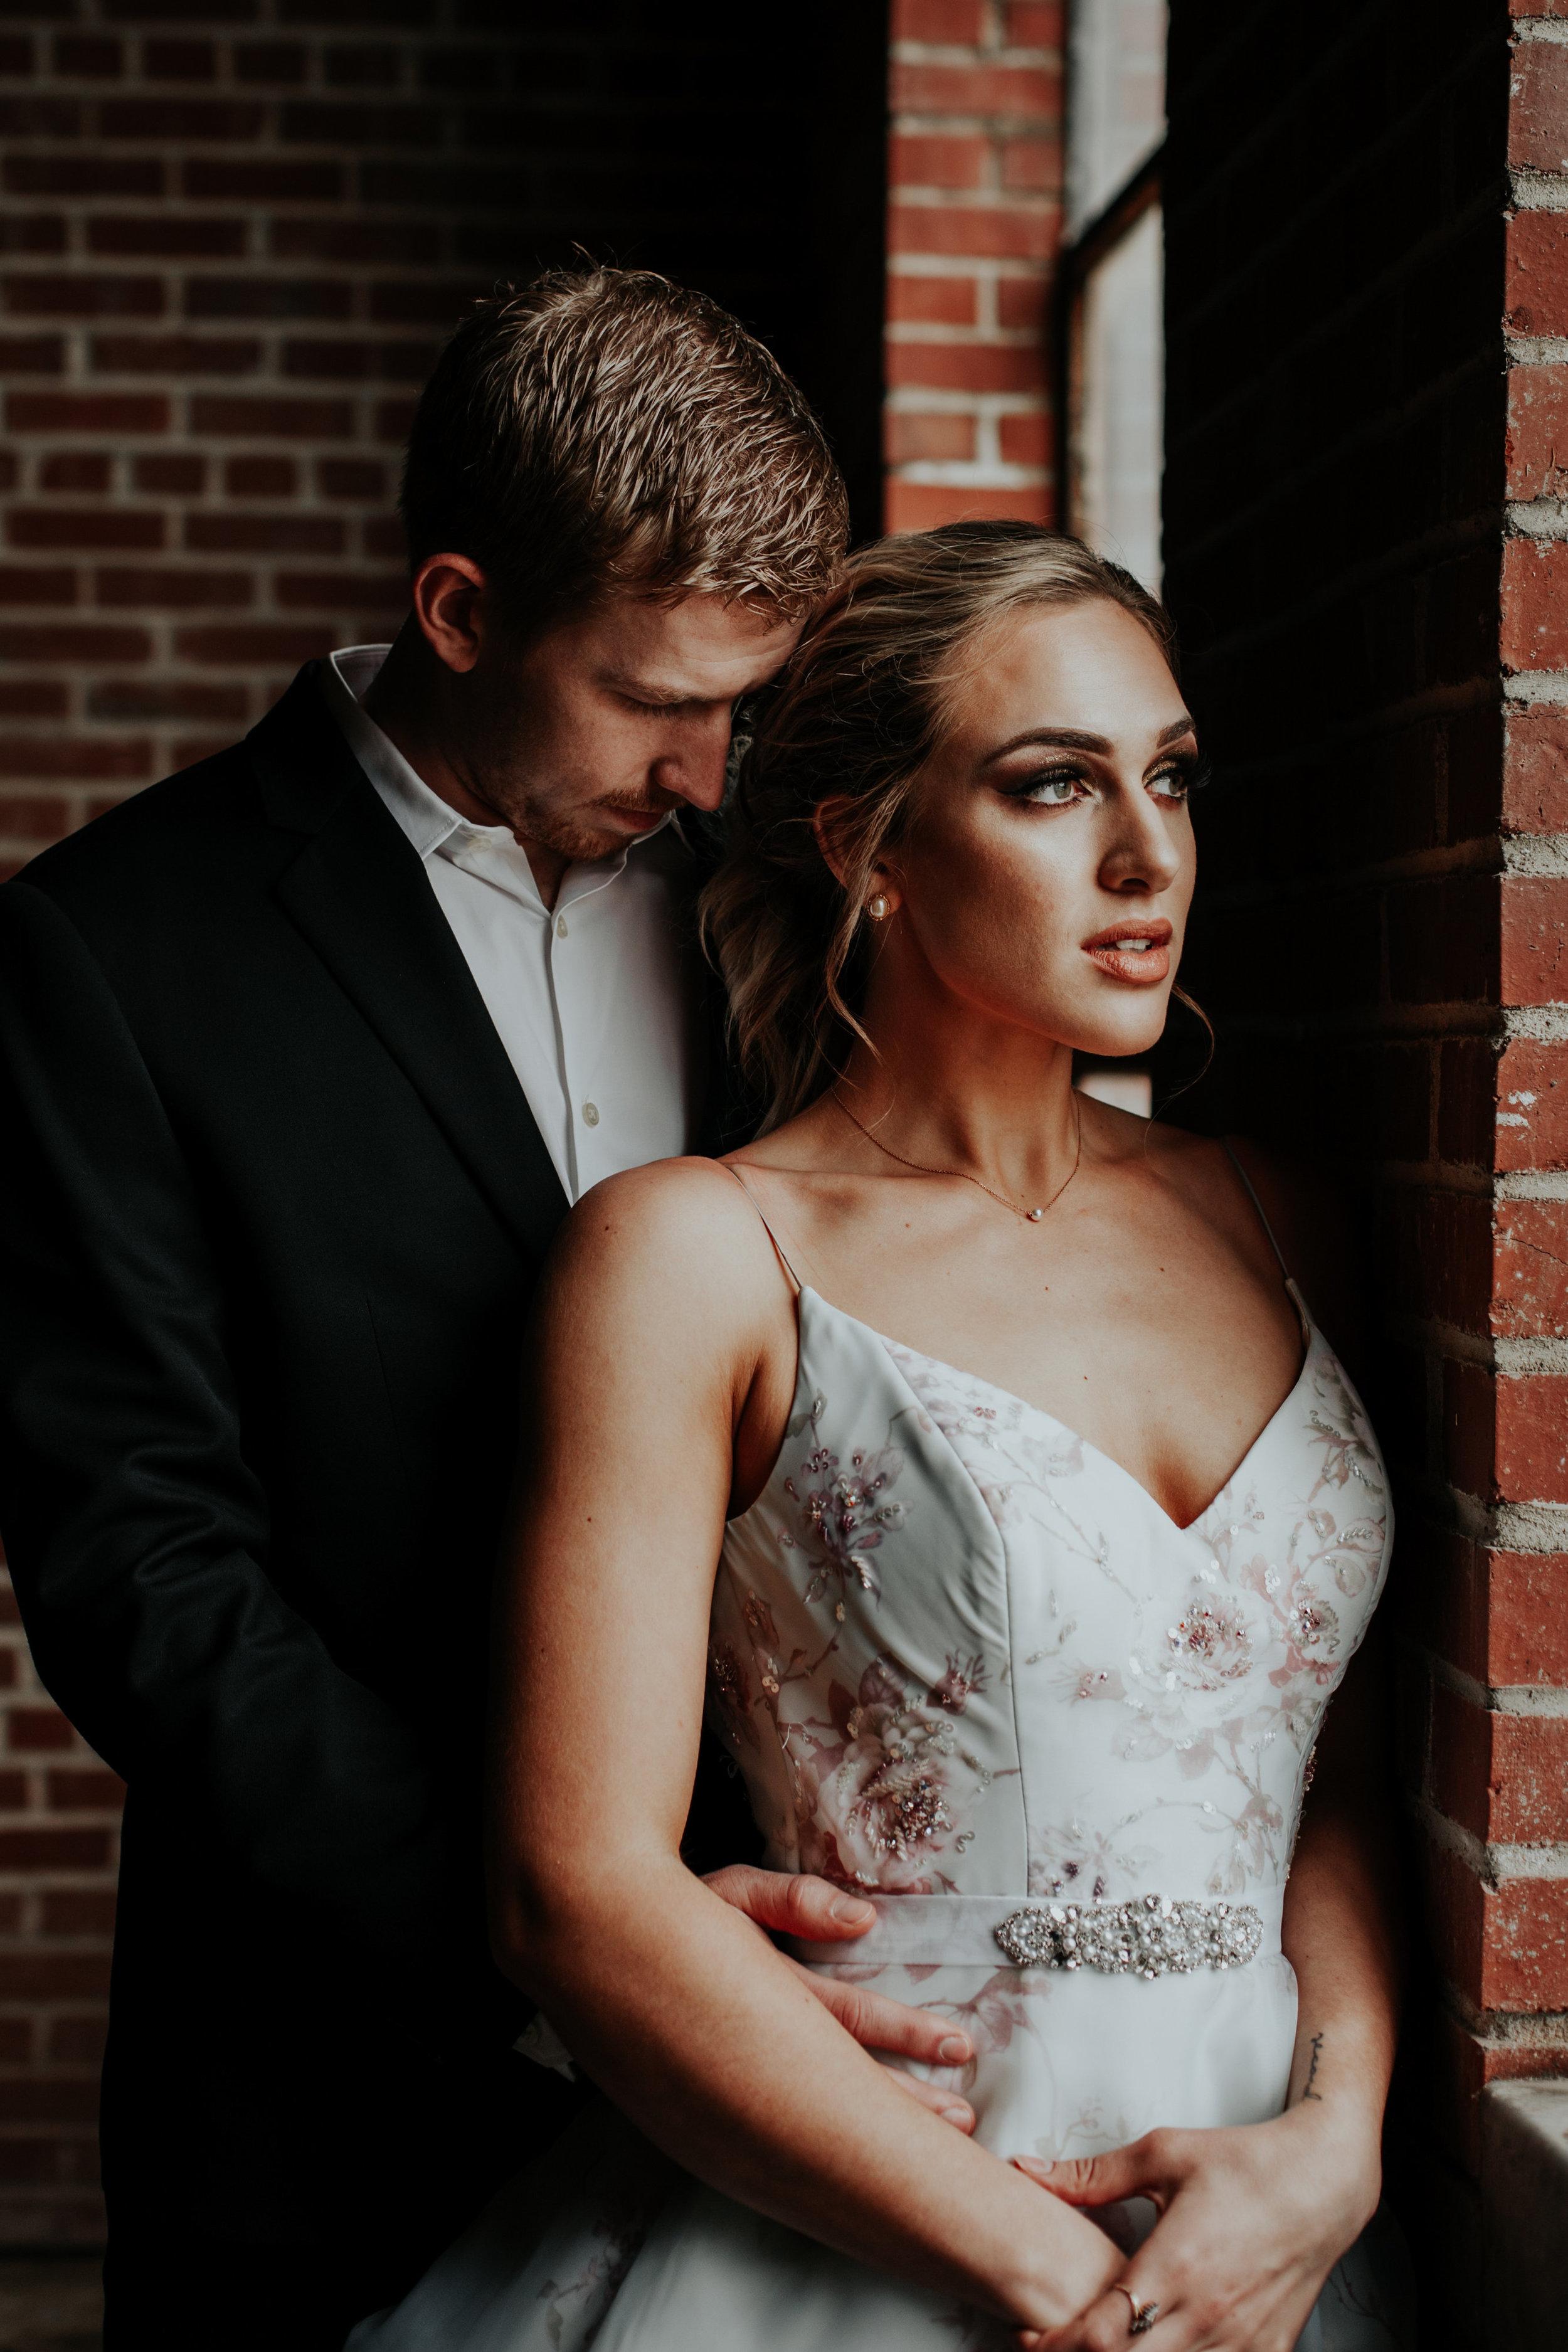 Romantic Industrial Bridal Shoot | Be Images Photography | Wichita, KS